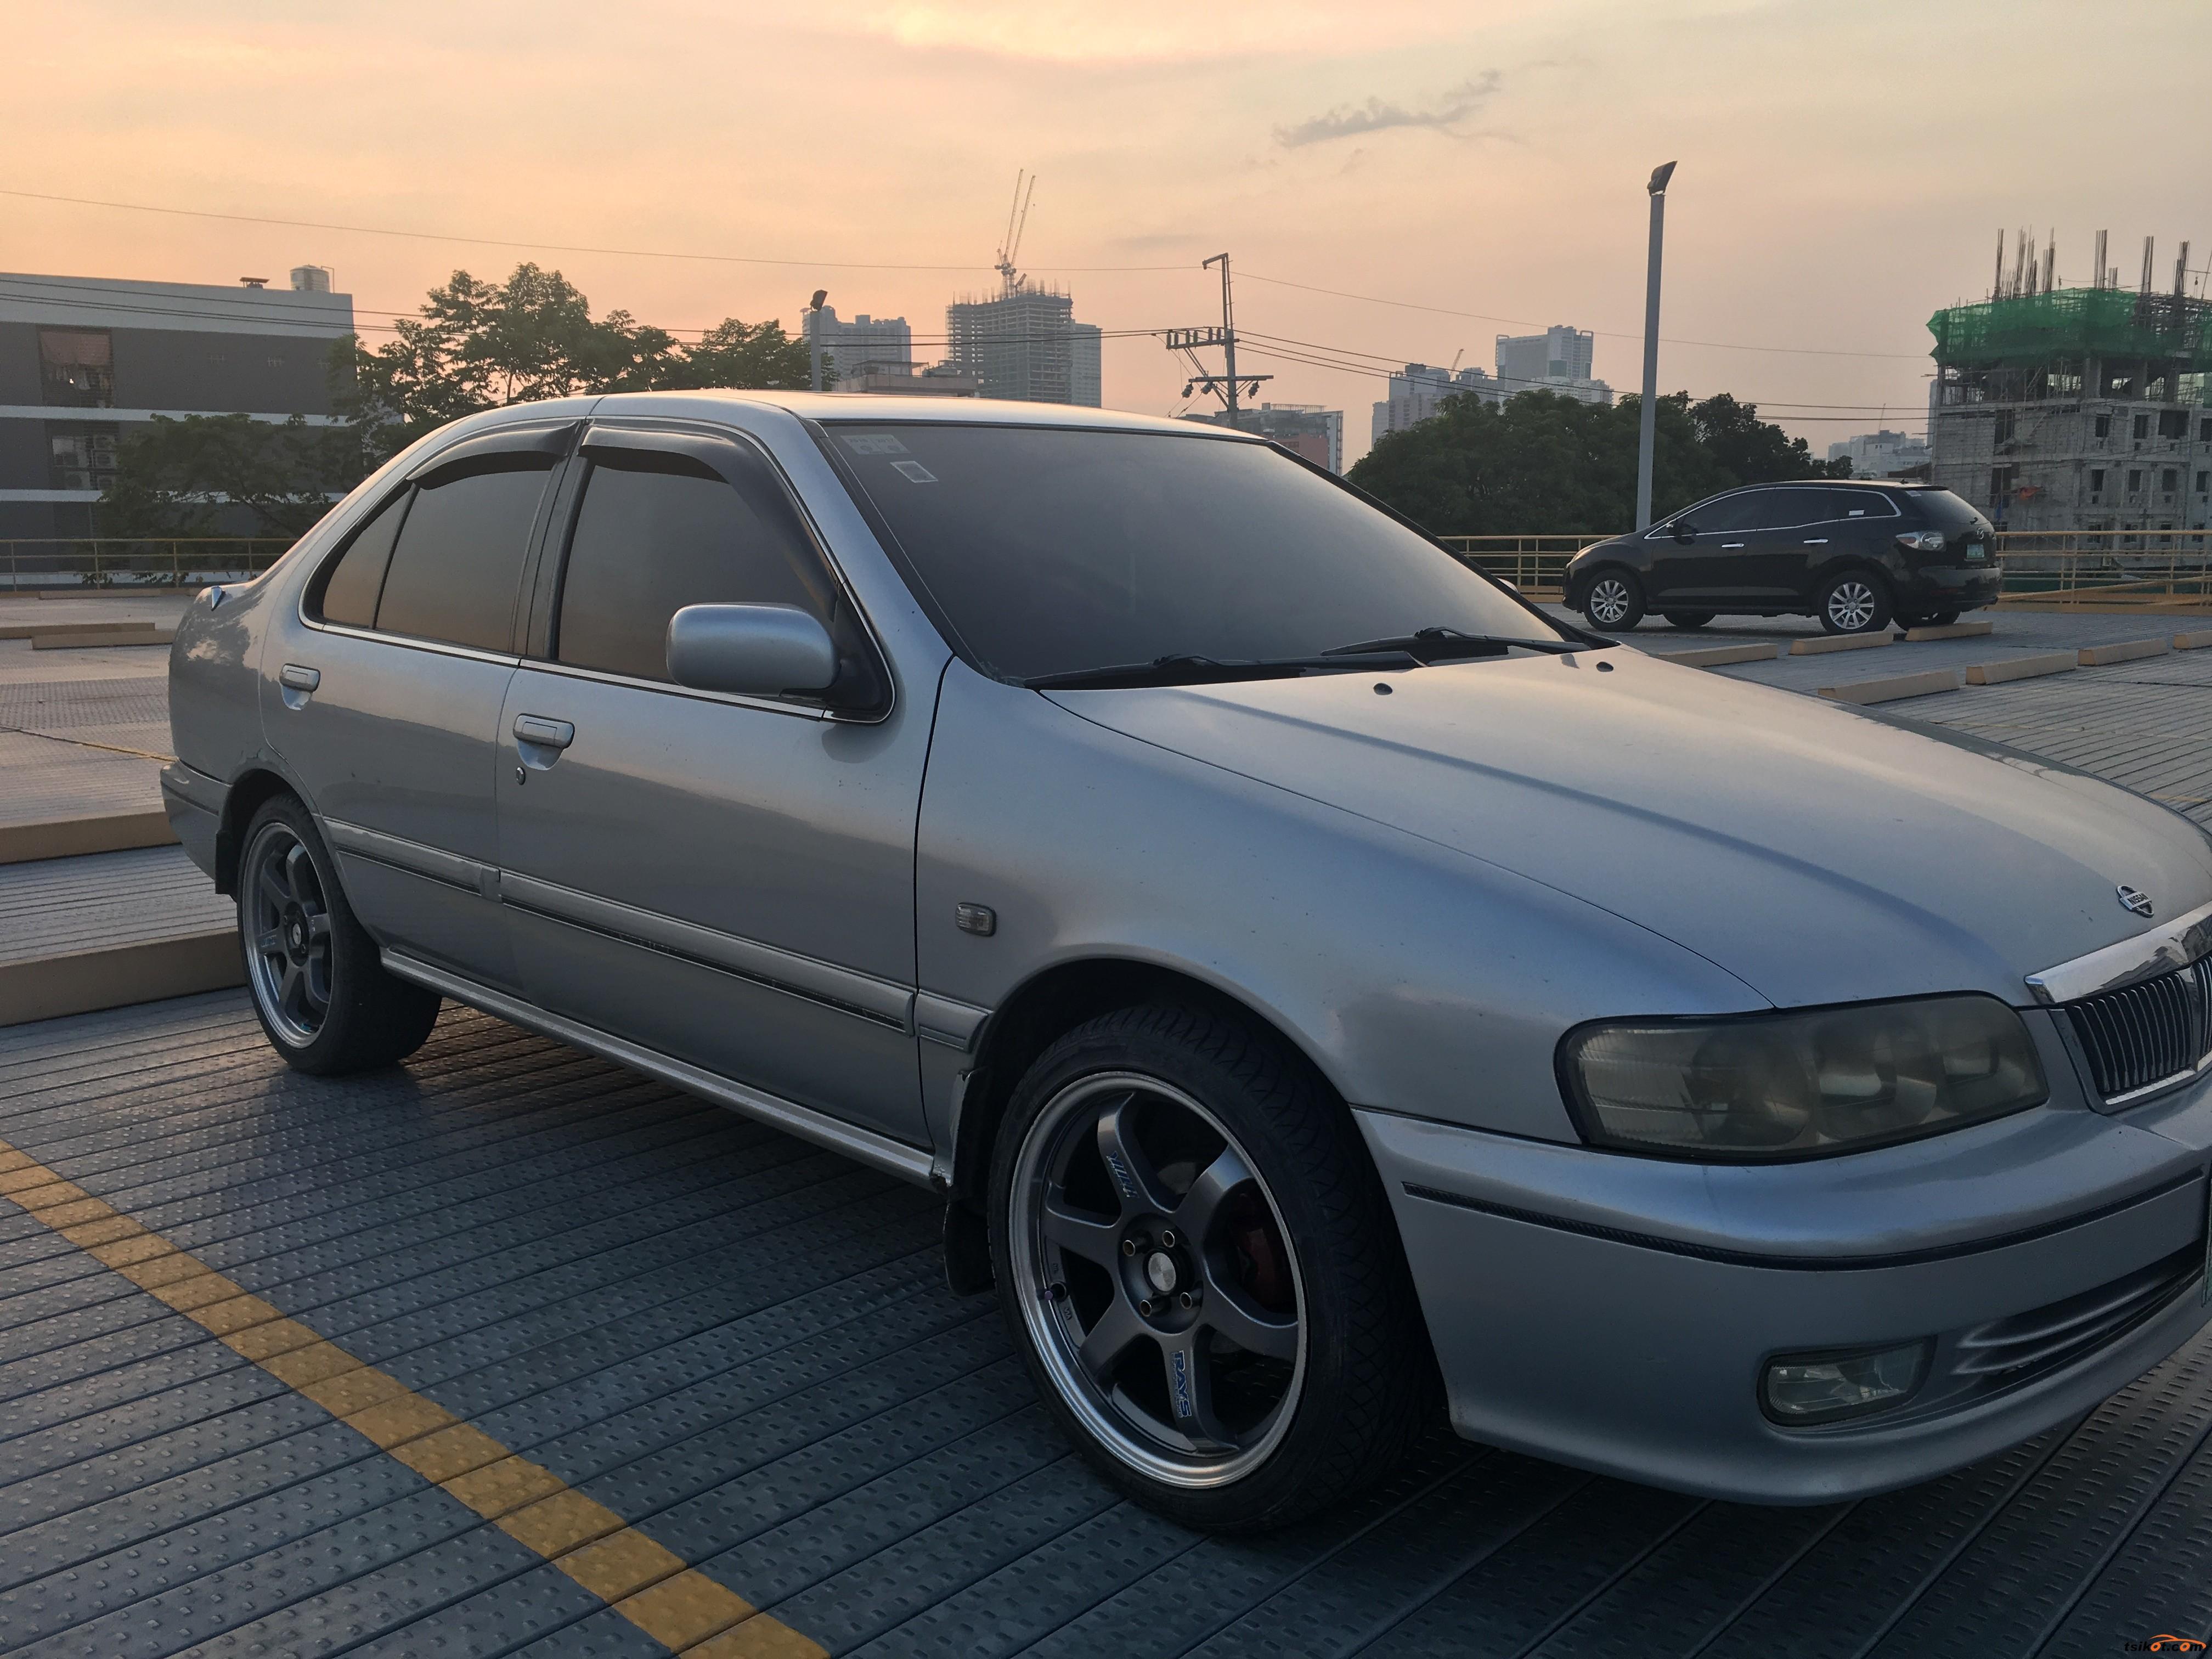 Nissan Sentra 2000 - 4